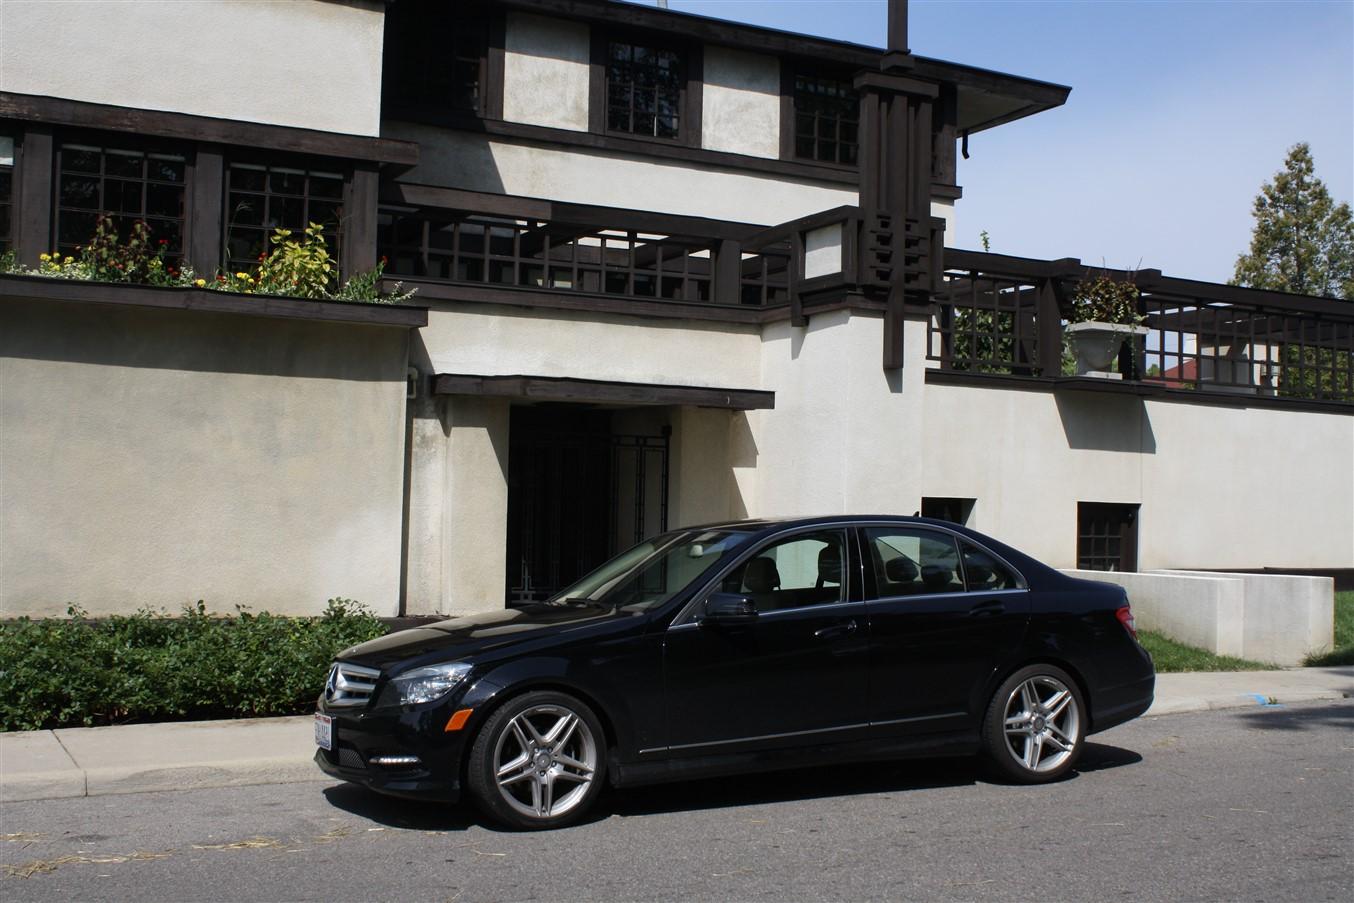 2011 08 20 Westcott House Springfield OH 3.jpg